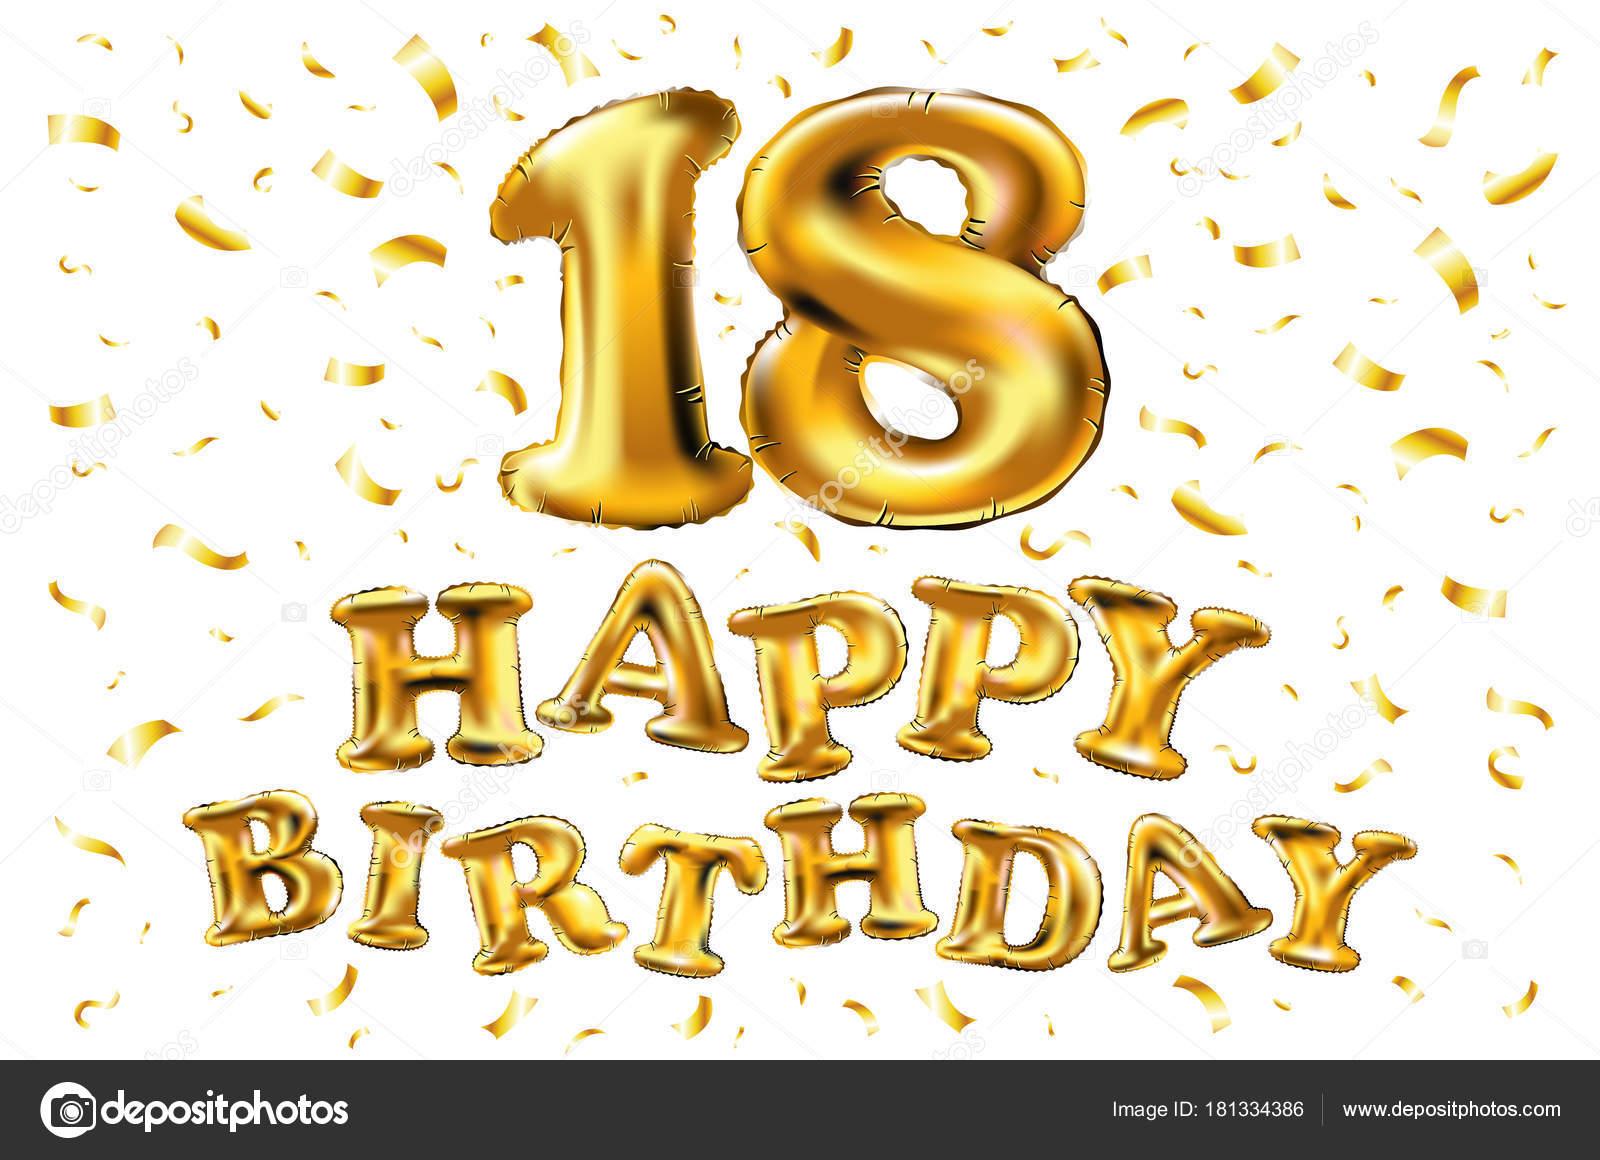 https depositphotos com 181334386 stock illustration 18th birthday celebration with gold html